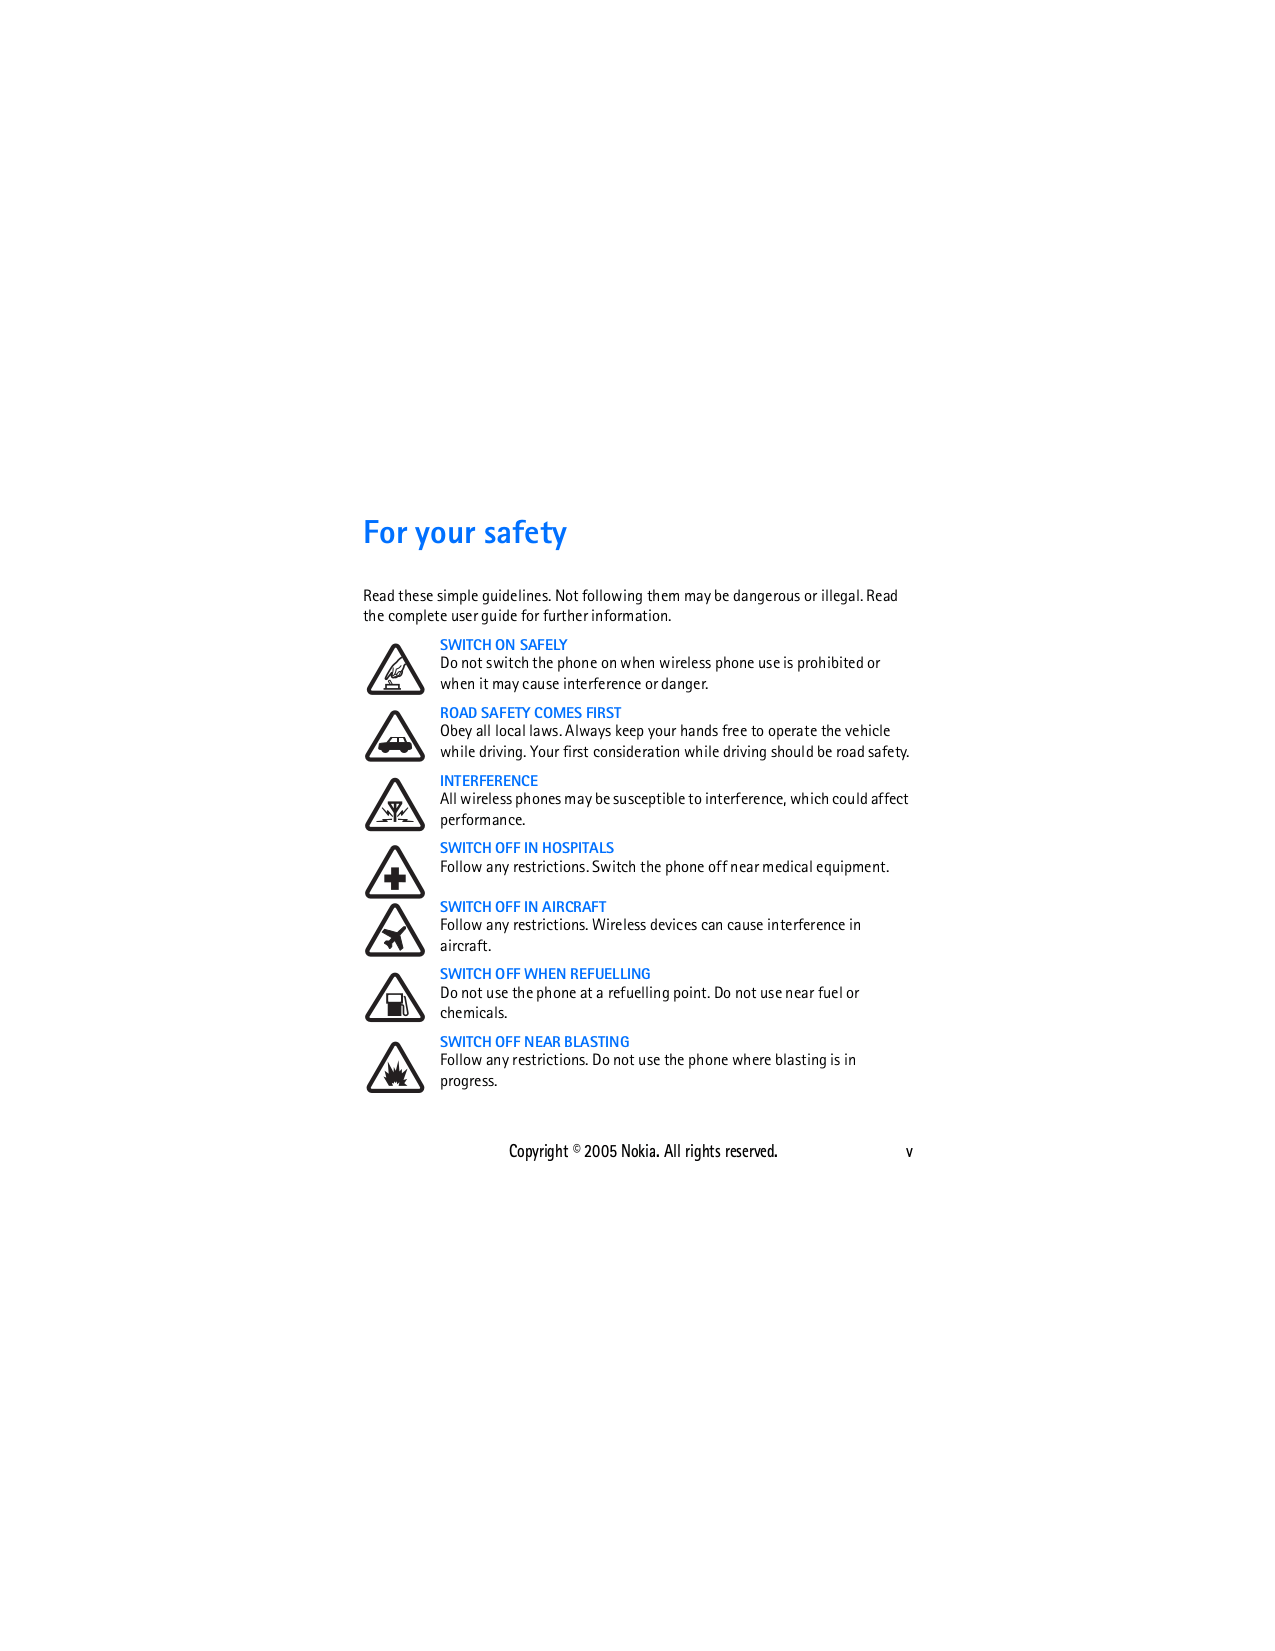 PDF manual for Nokia Cell Phone 1110i